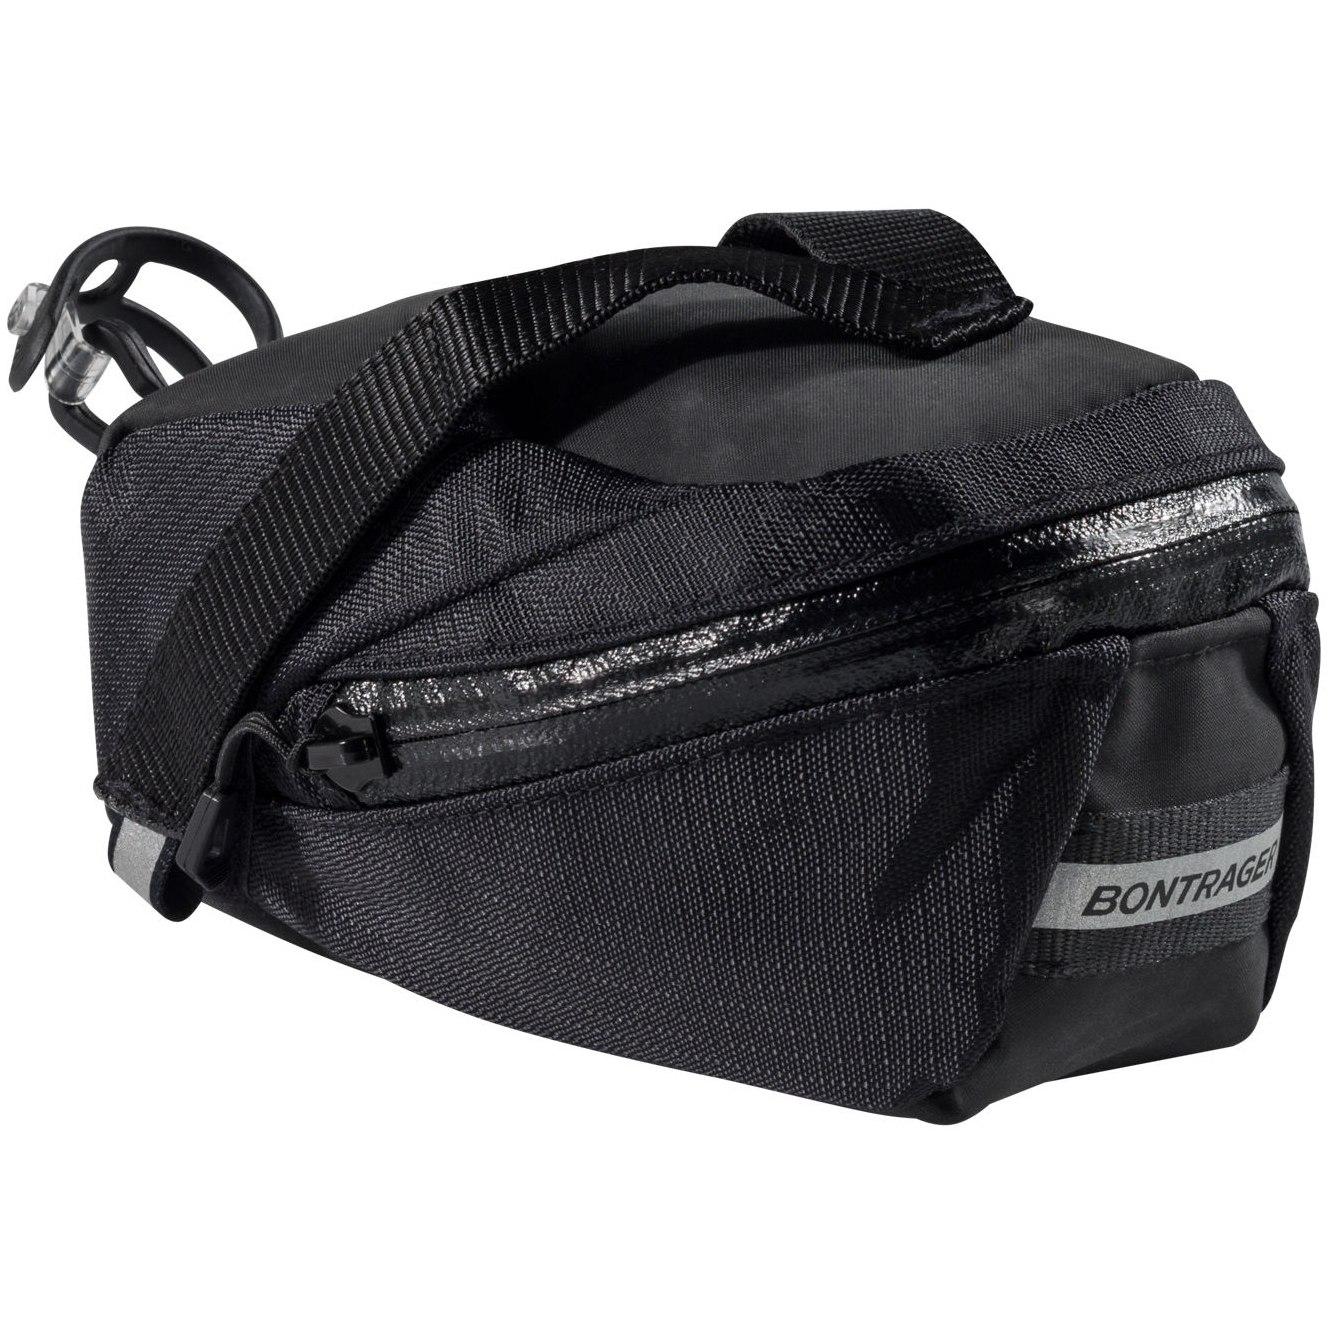 Bontrager Elite Medium Seat Pack - black